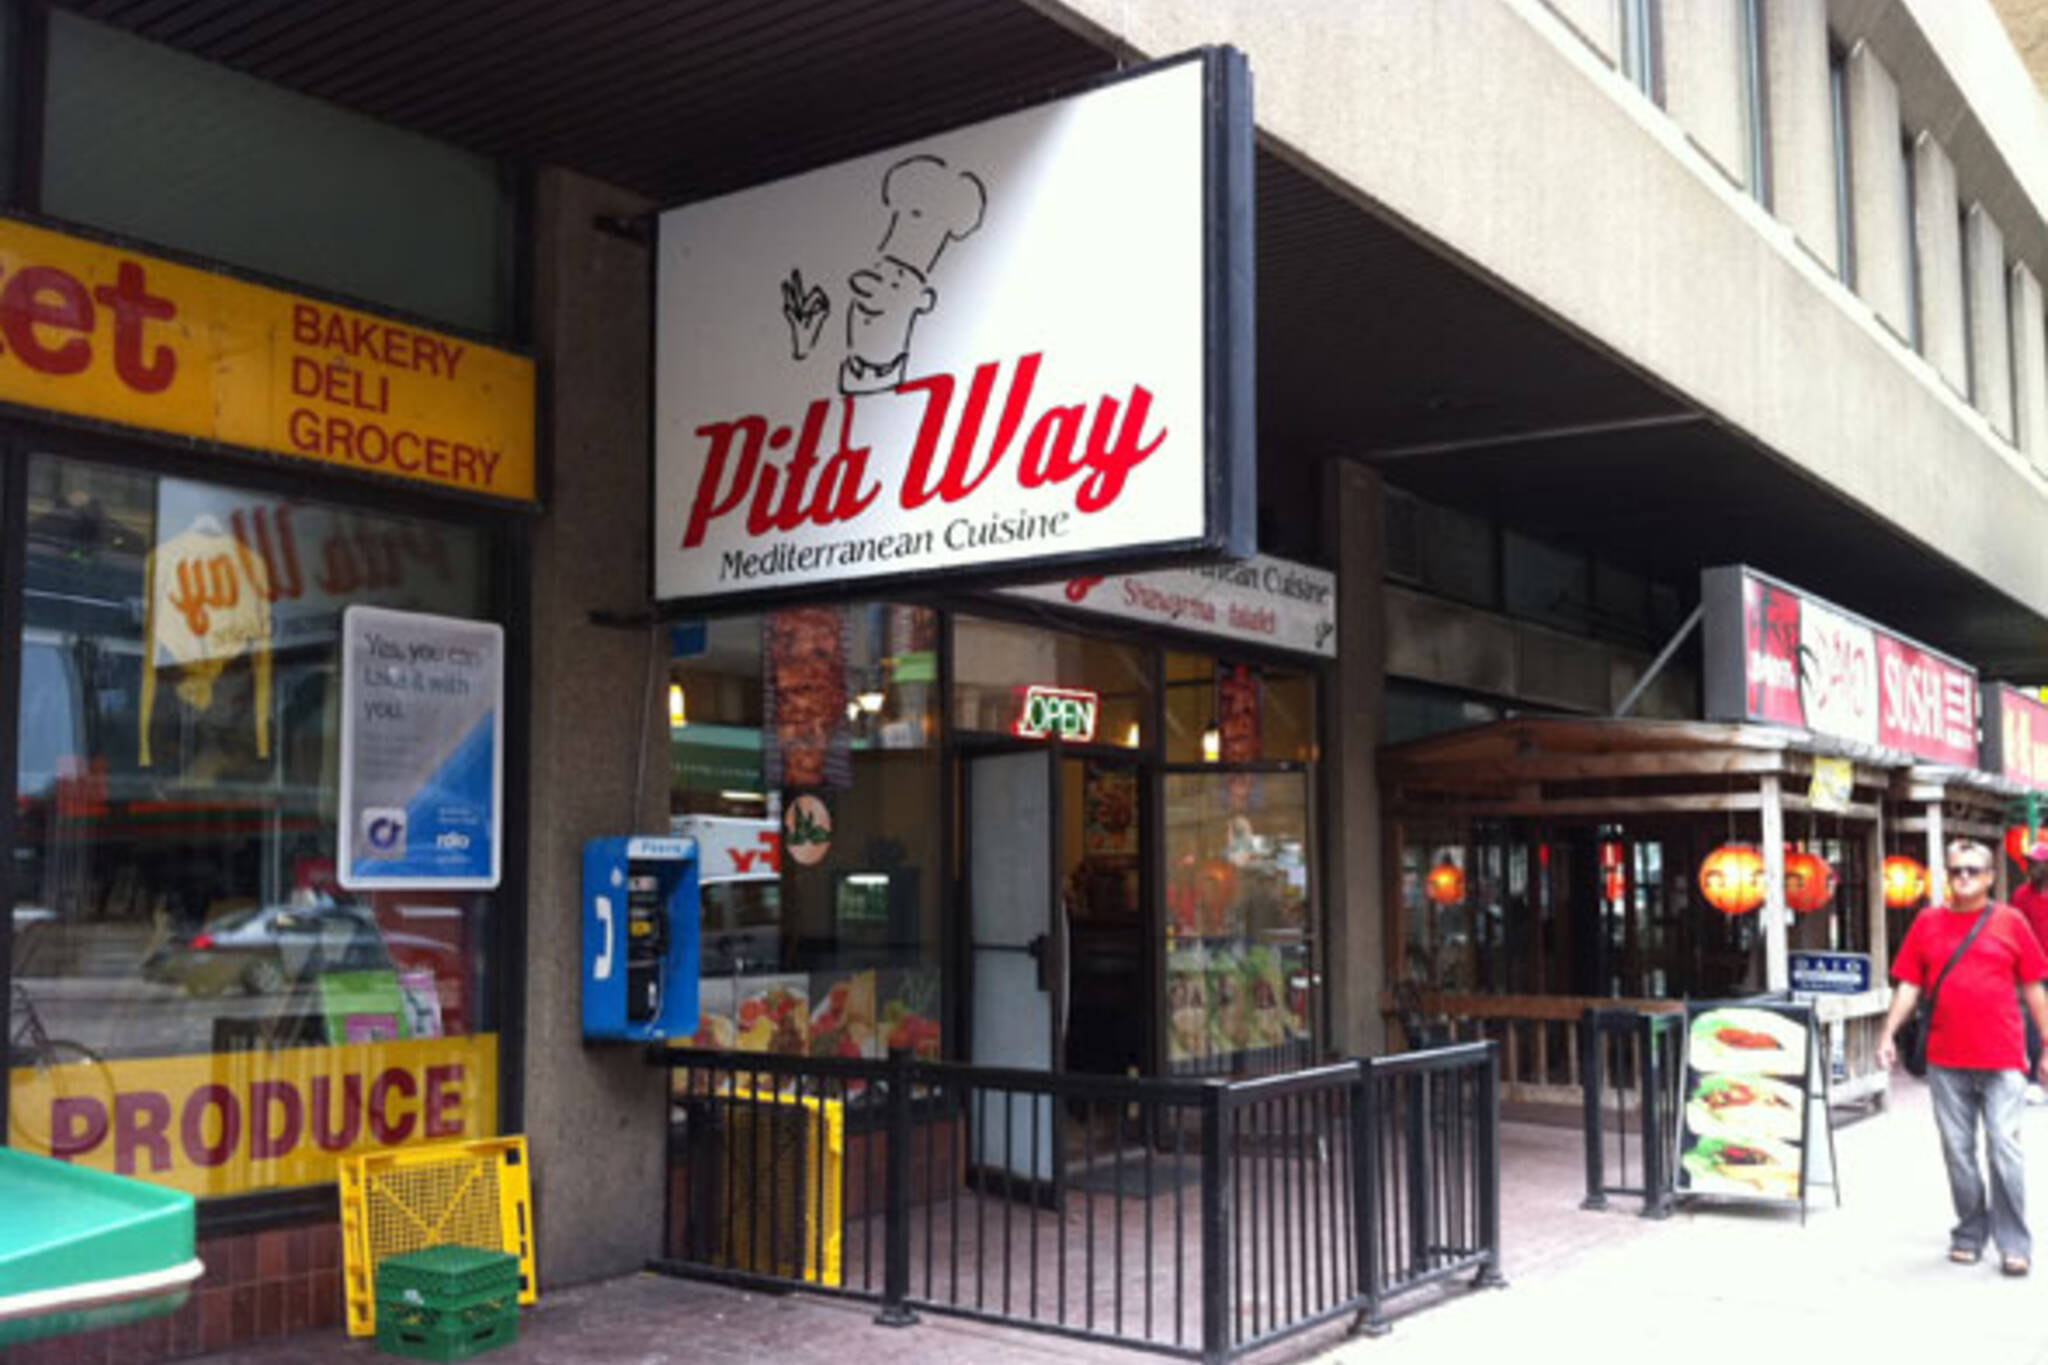 Pita Way Carlton St. Toronto